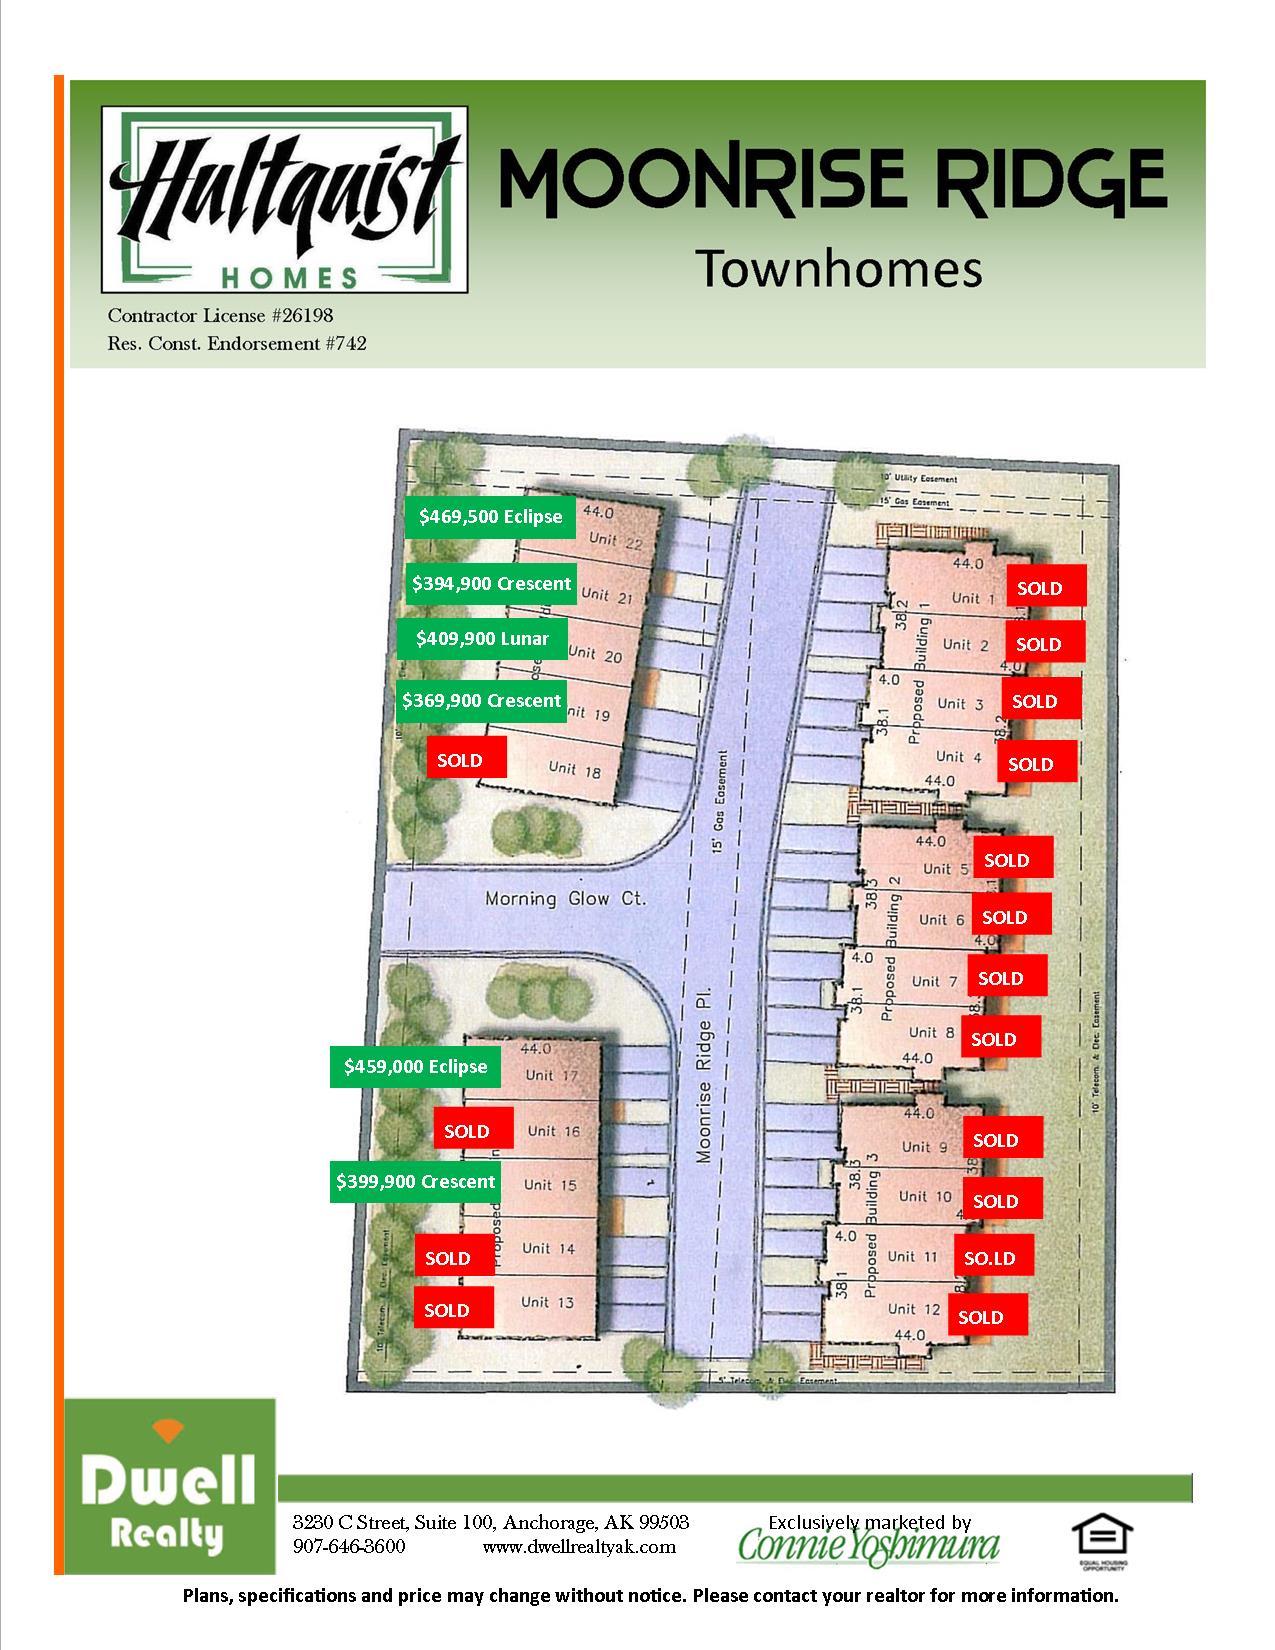 Moonrise Ridge Site Map as of 10-2-15